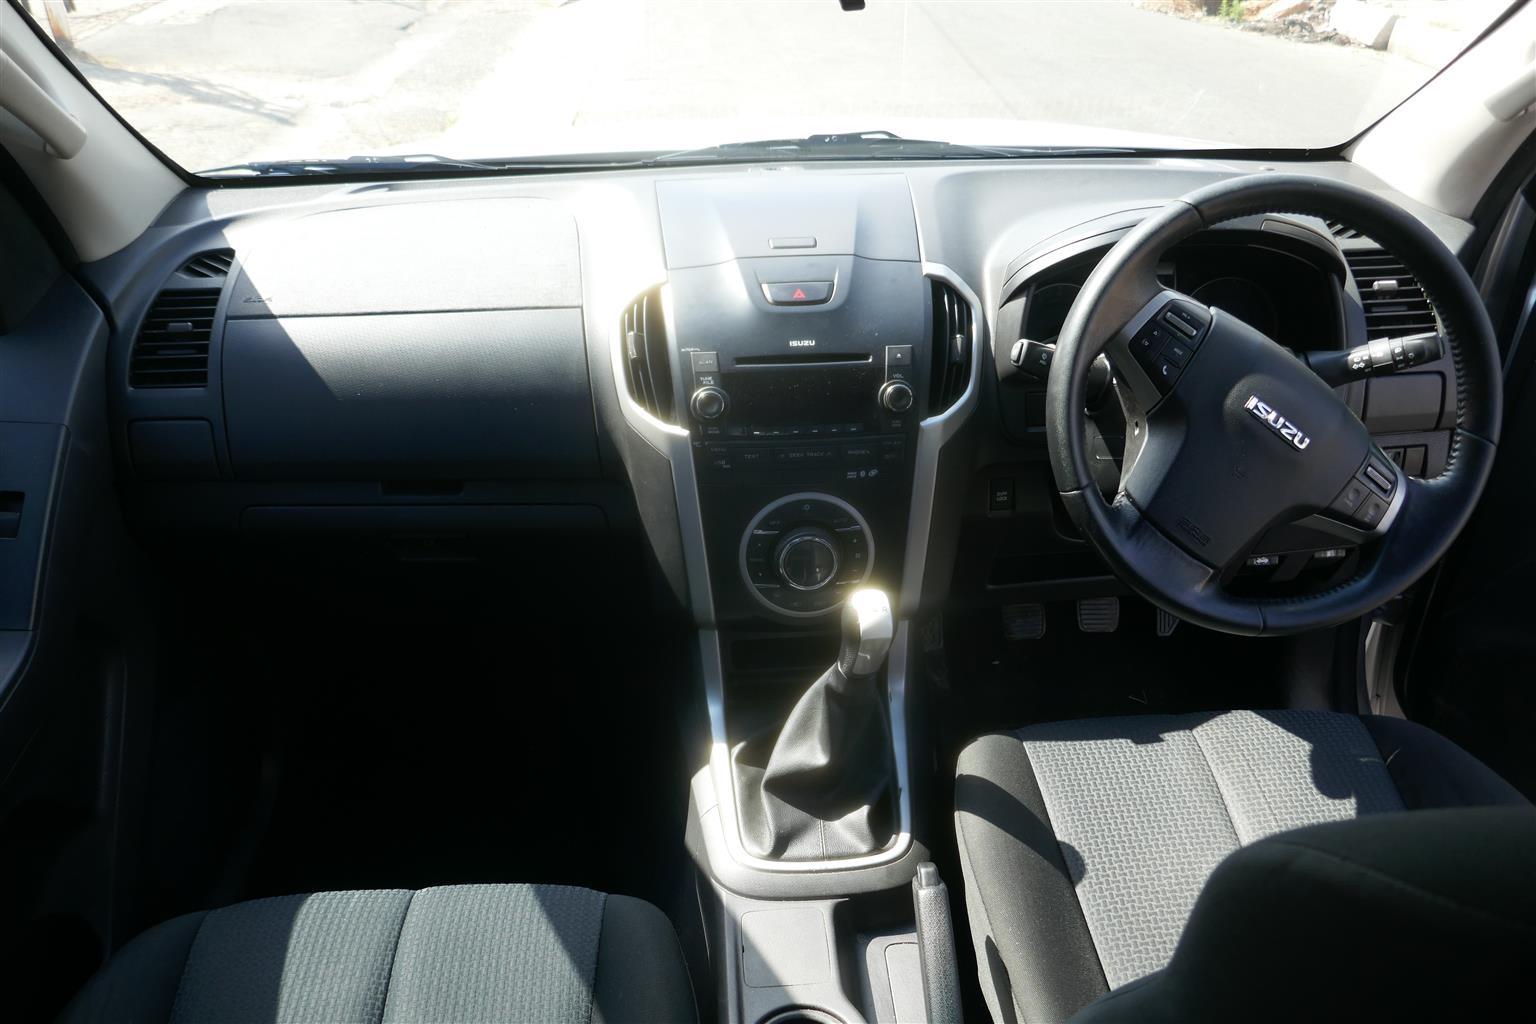 2015 ISUZU KB 300DTEQ XTRA CAB 4X2